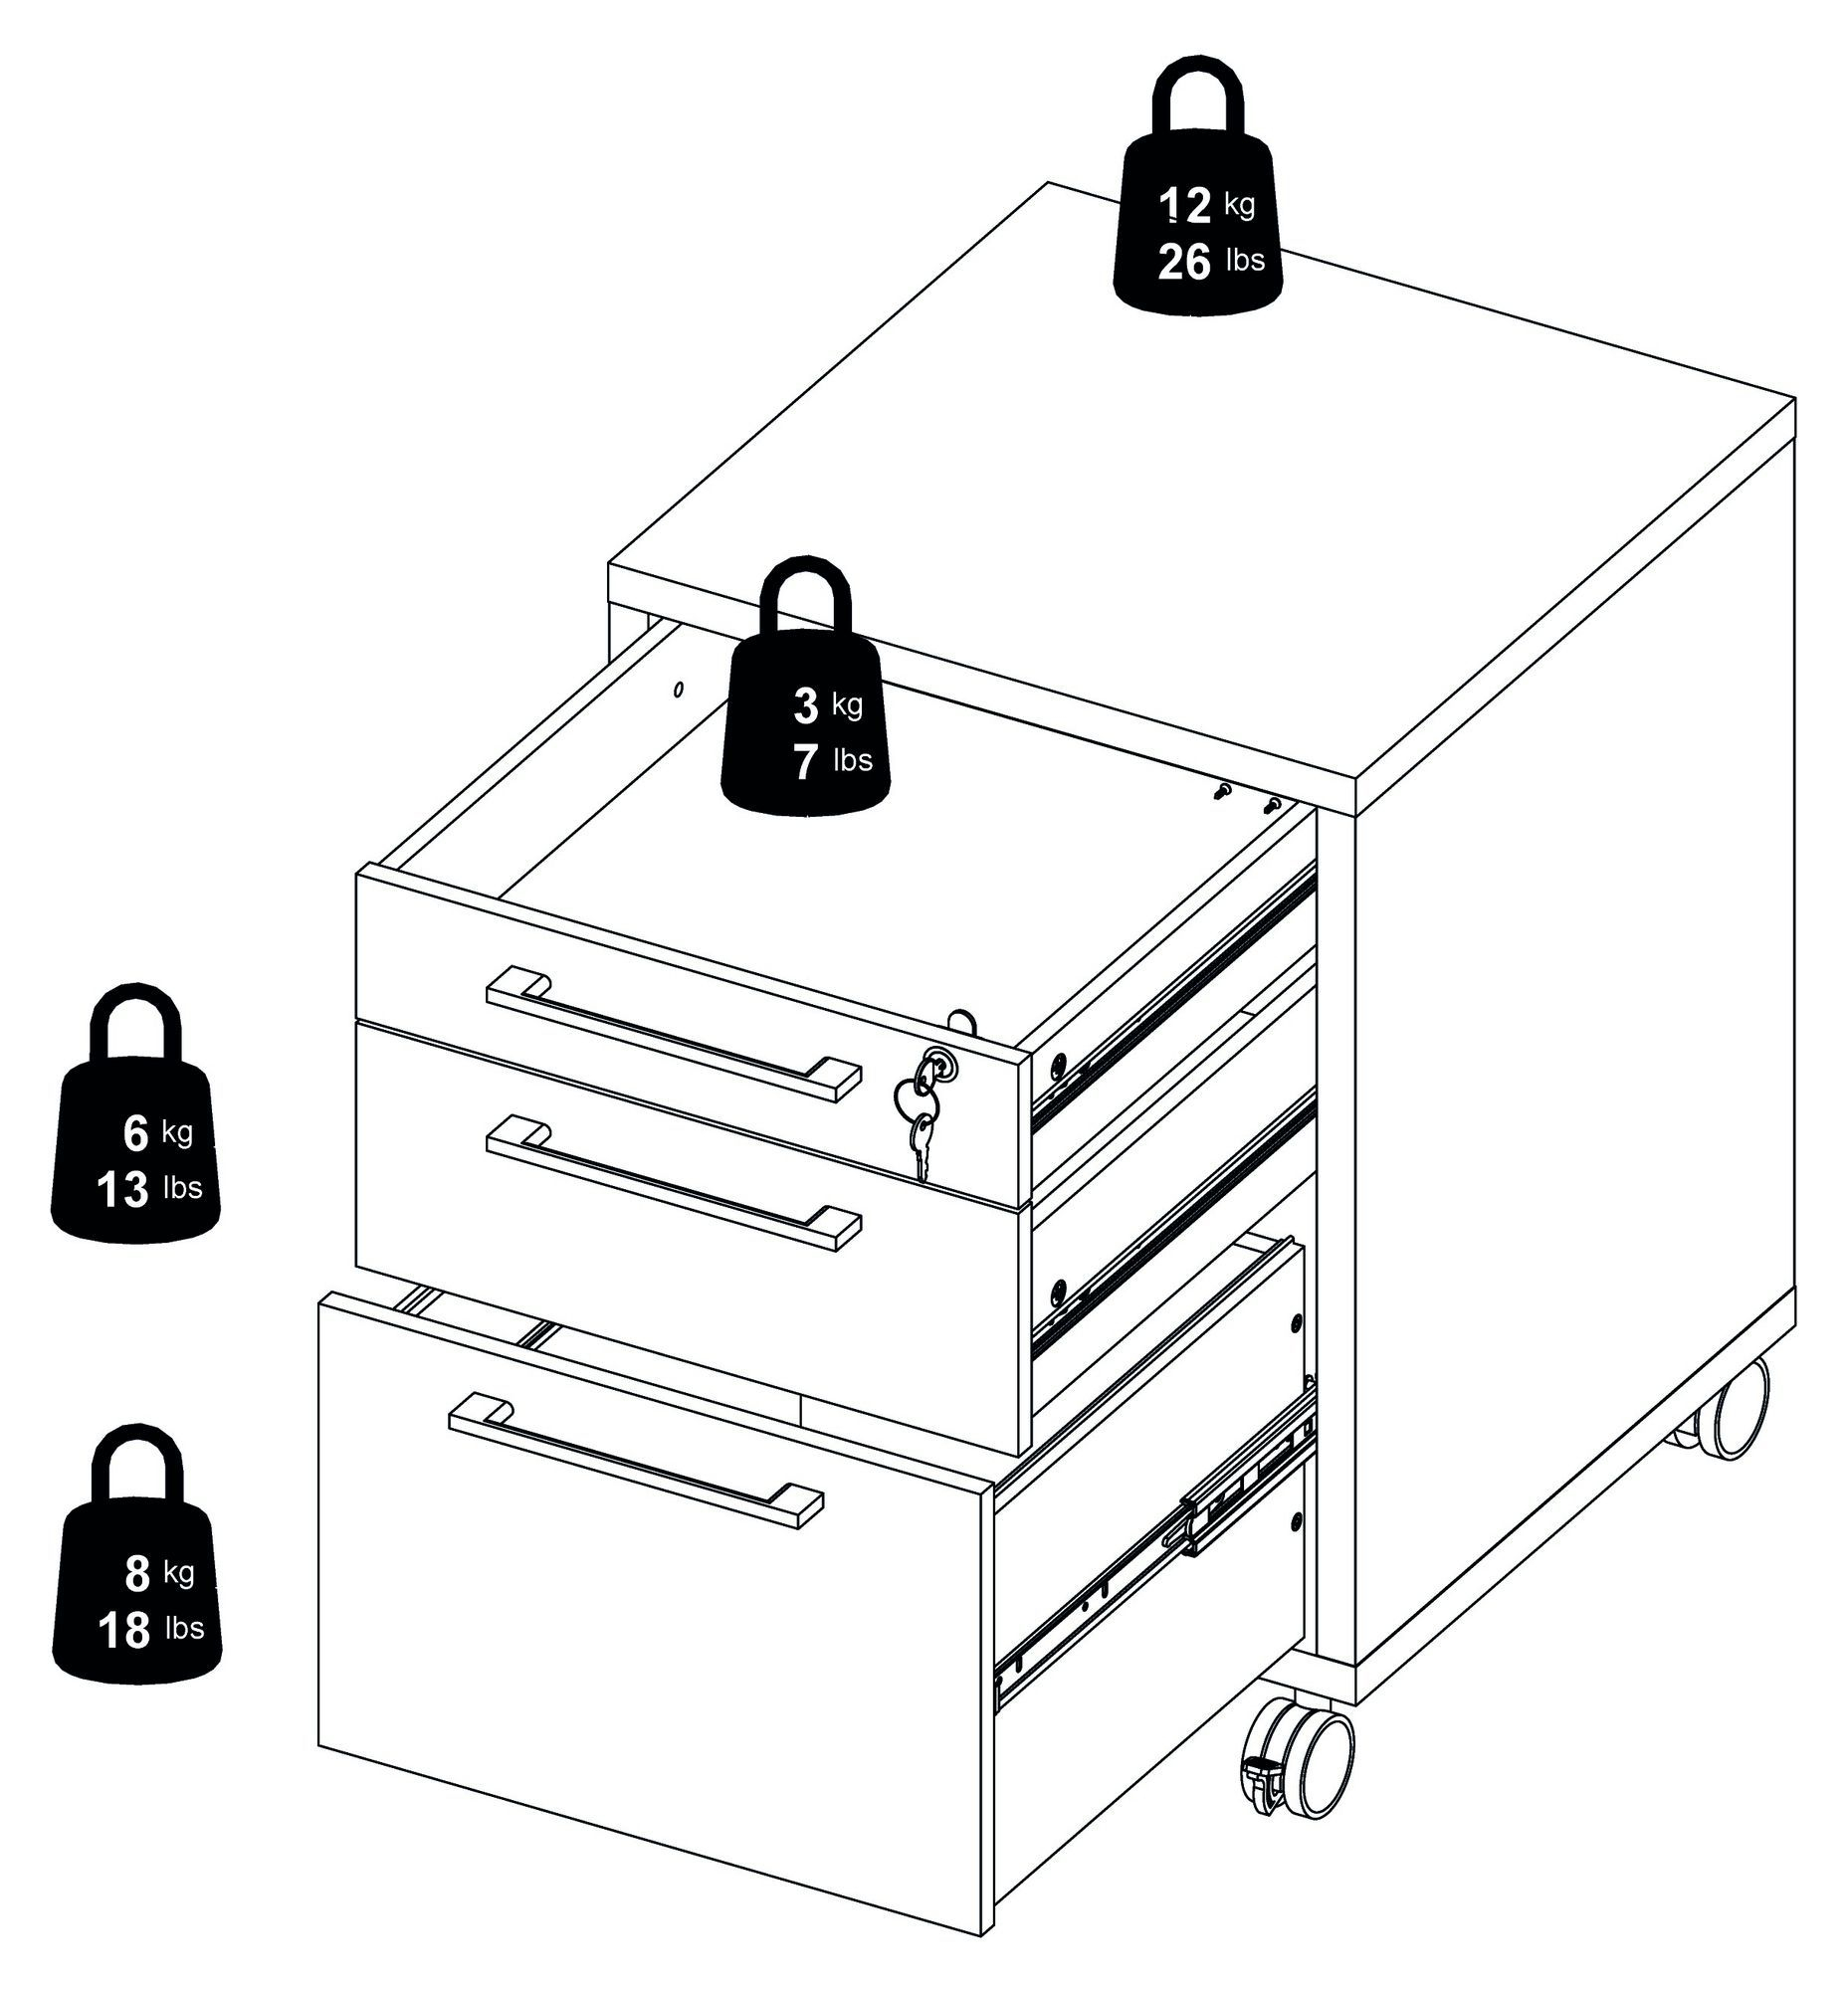 Prima Skuffemodul - Sort m/3 skuffer - Skuffemodul med hjul i sort ask